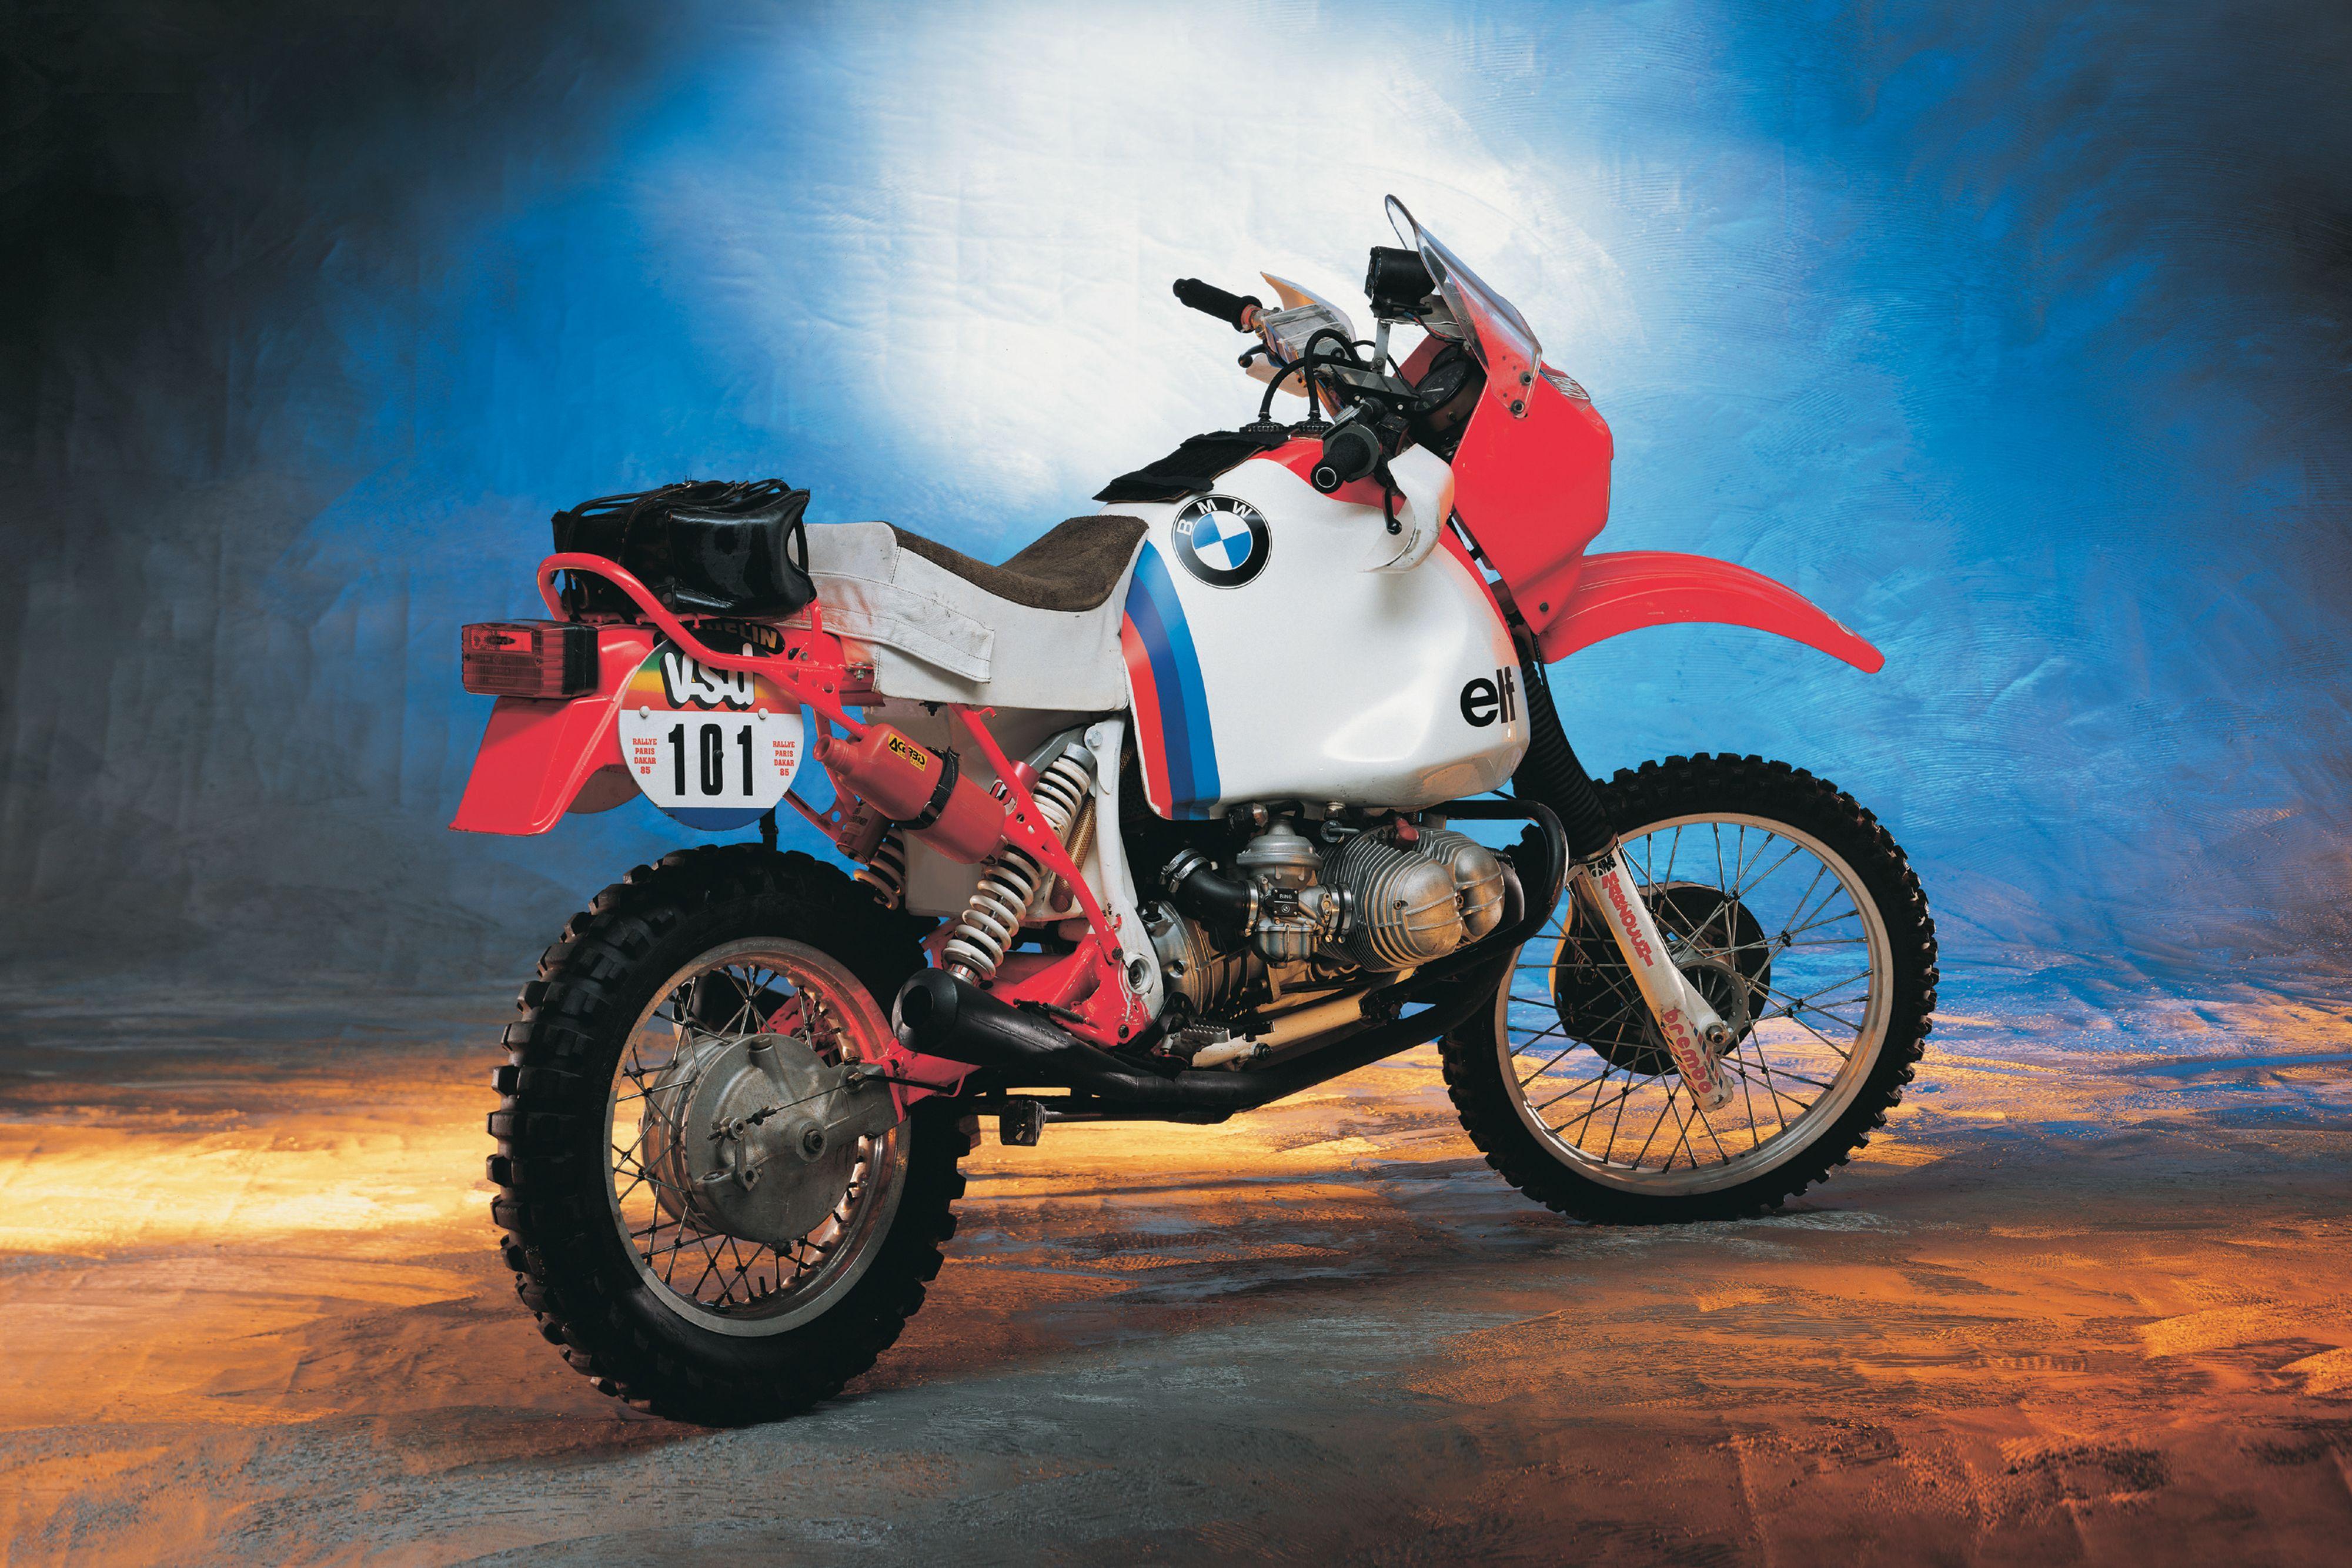 In 1985 A Tiny Belgian Won Dakar Against All Odds